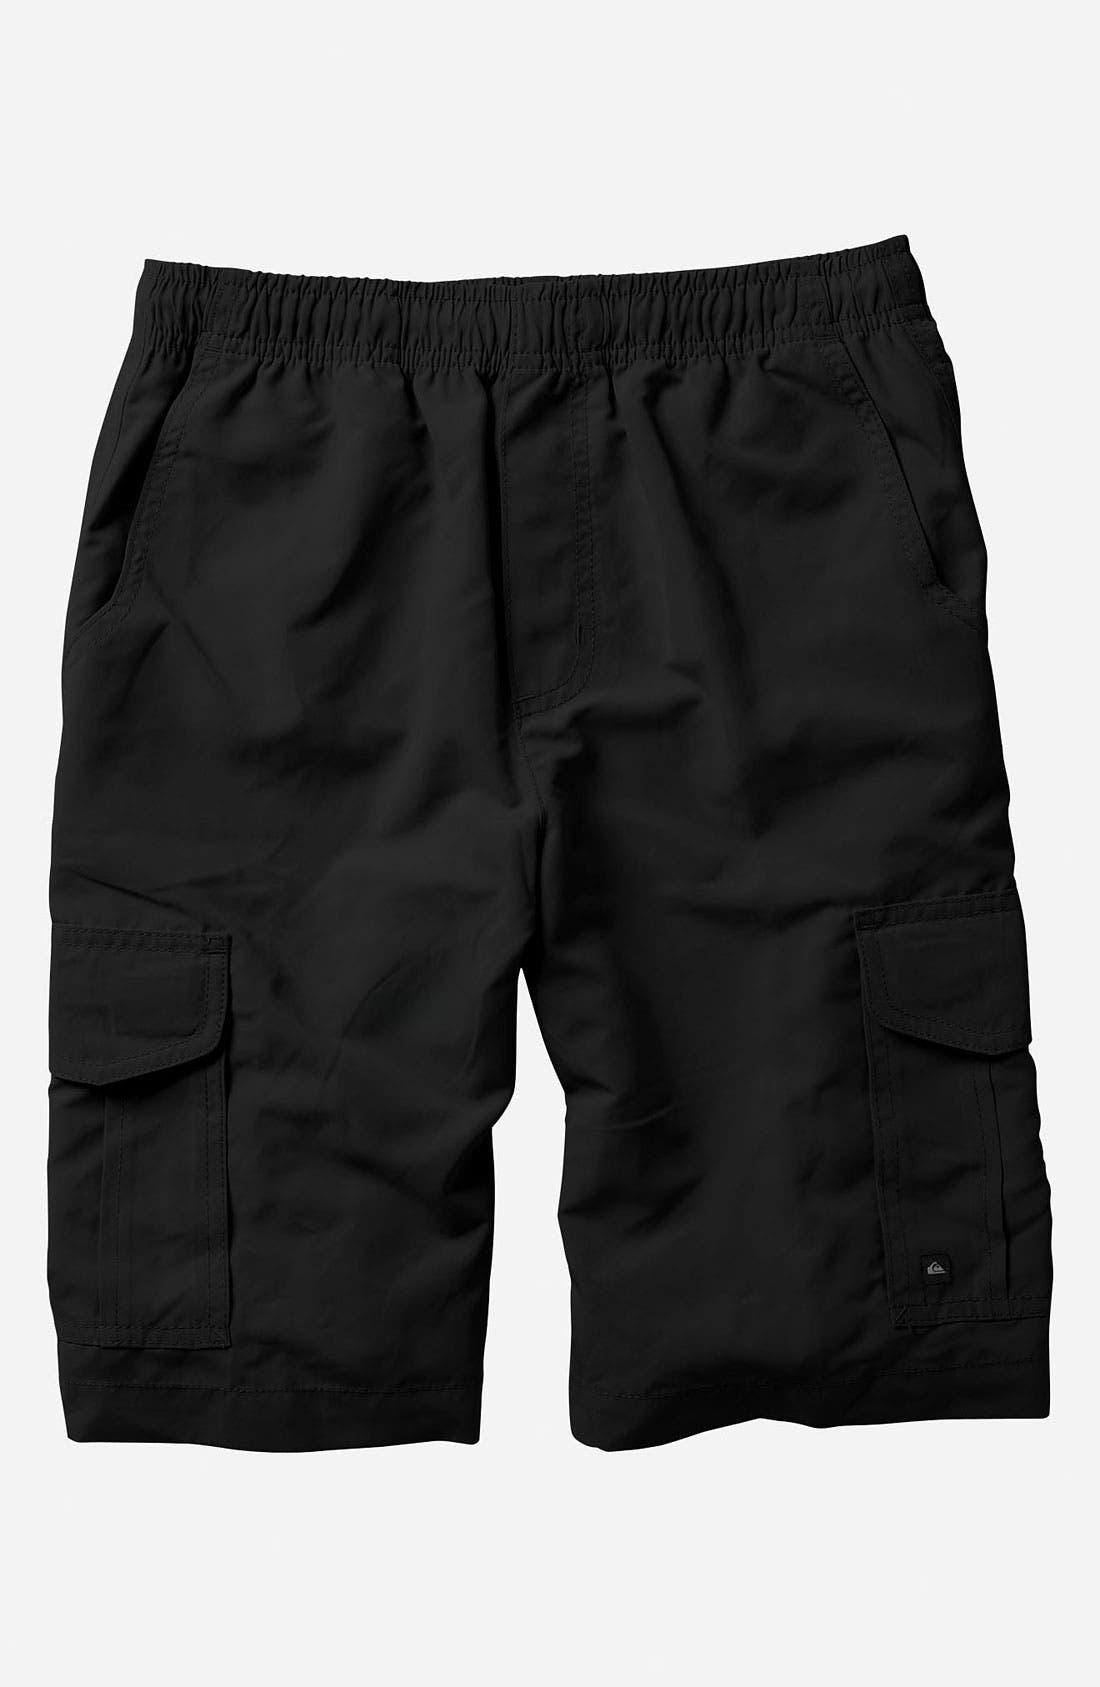 Alternate Image 1 Selected - Quiksilver 'Stylo' Cargo Shorts (Big Boys)